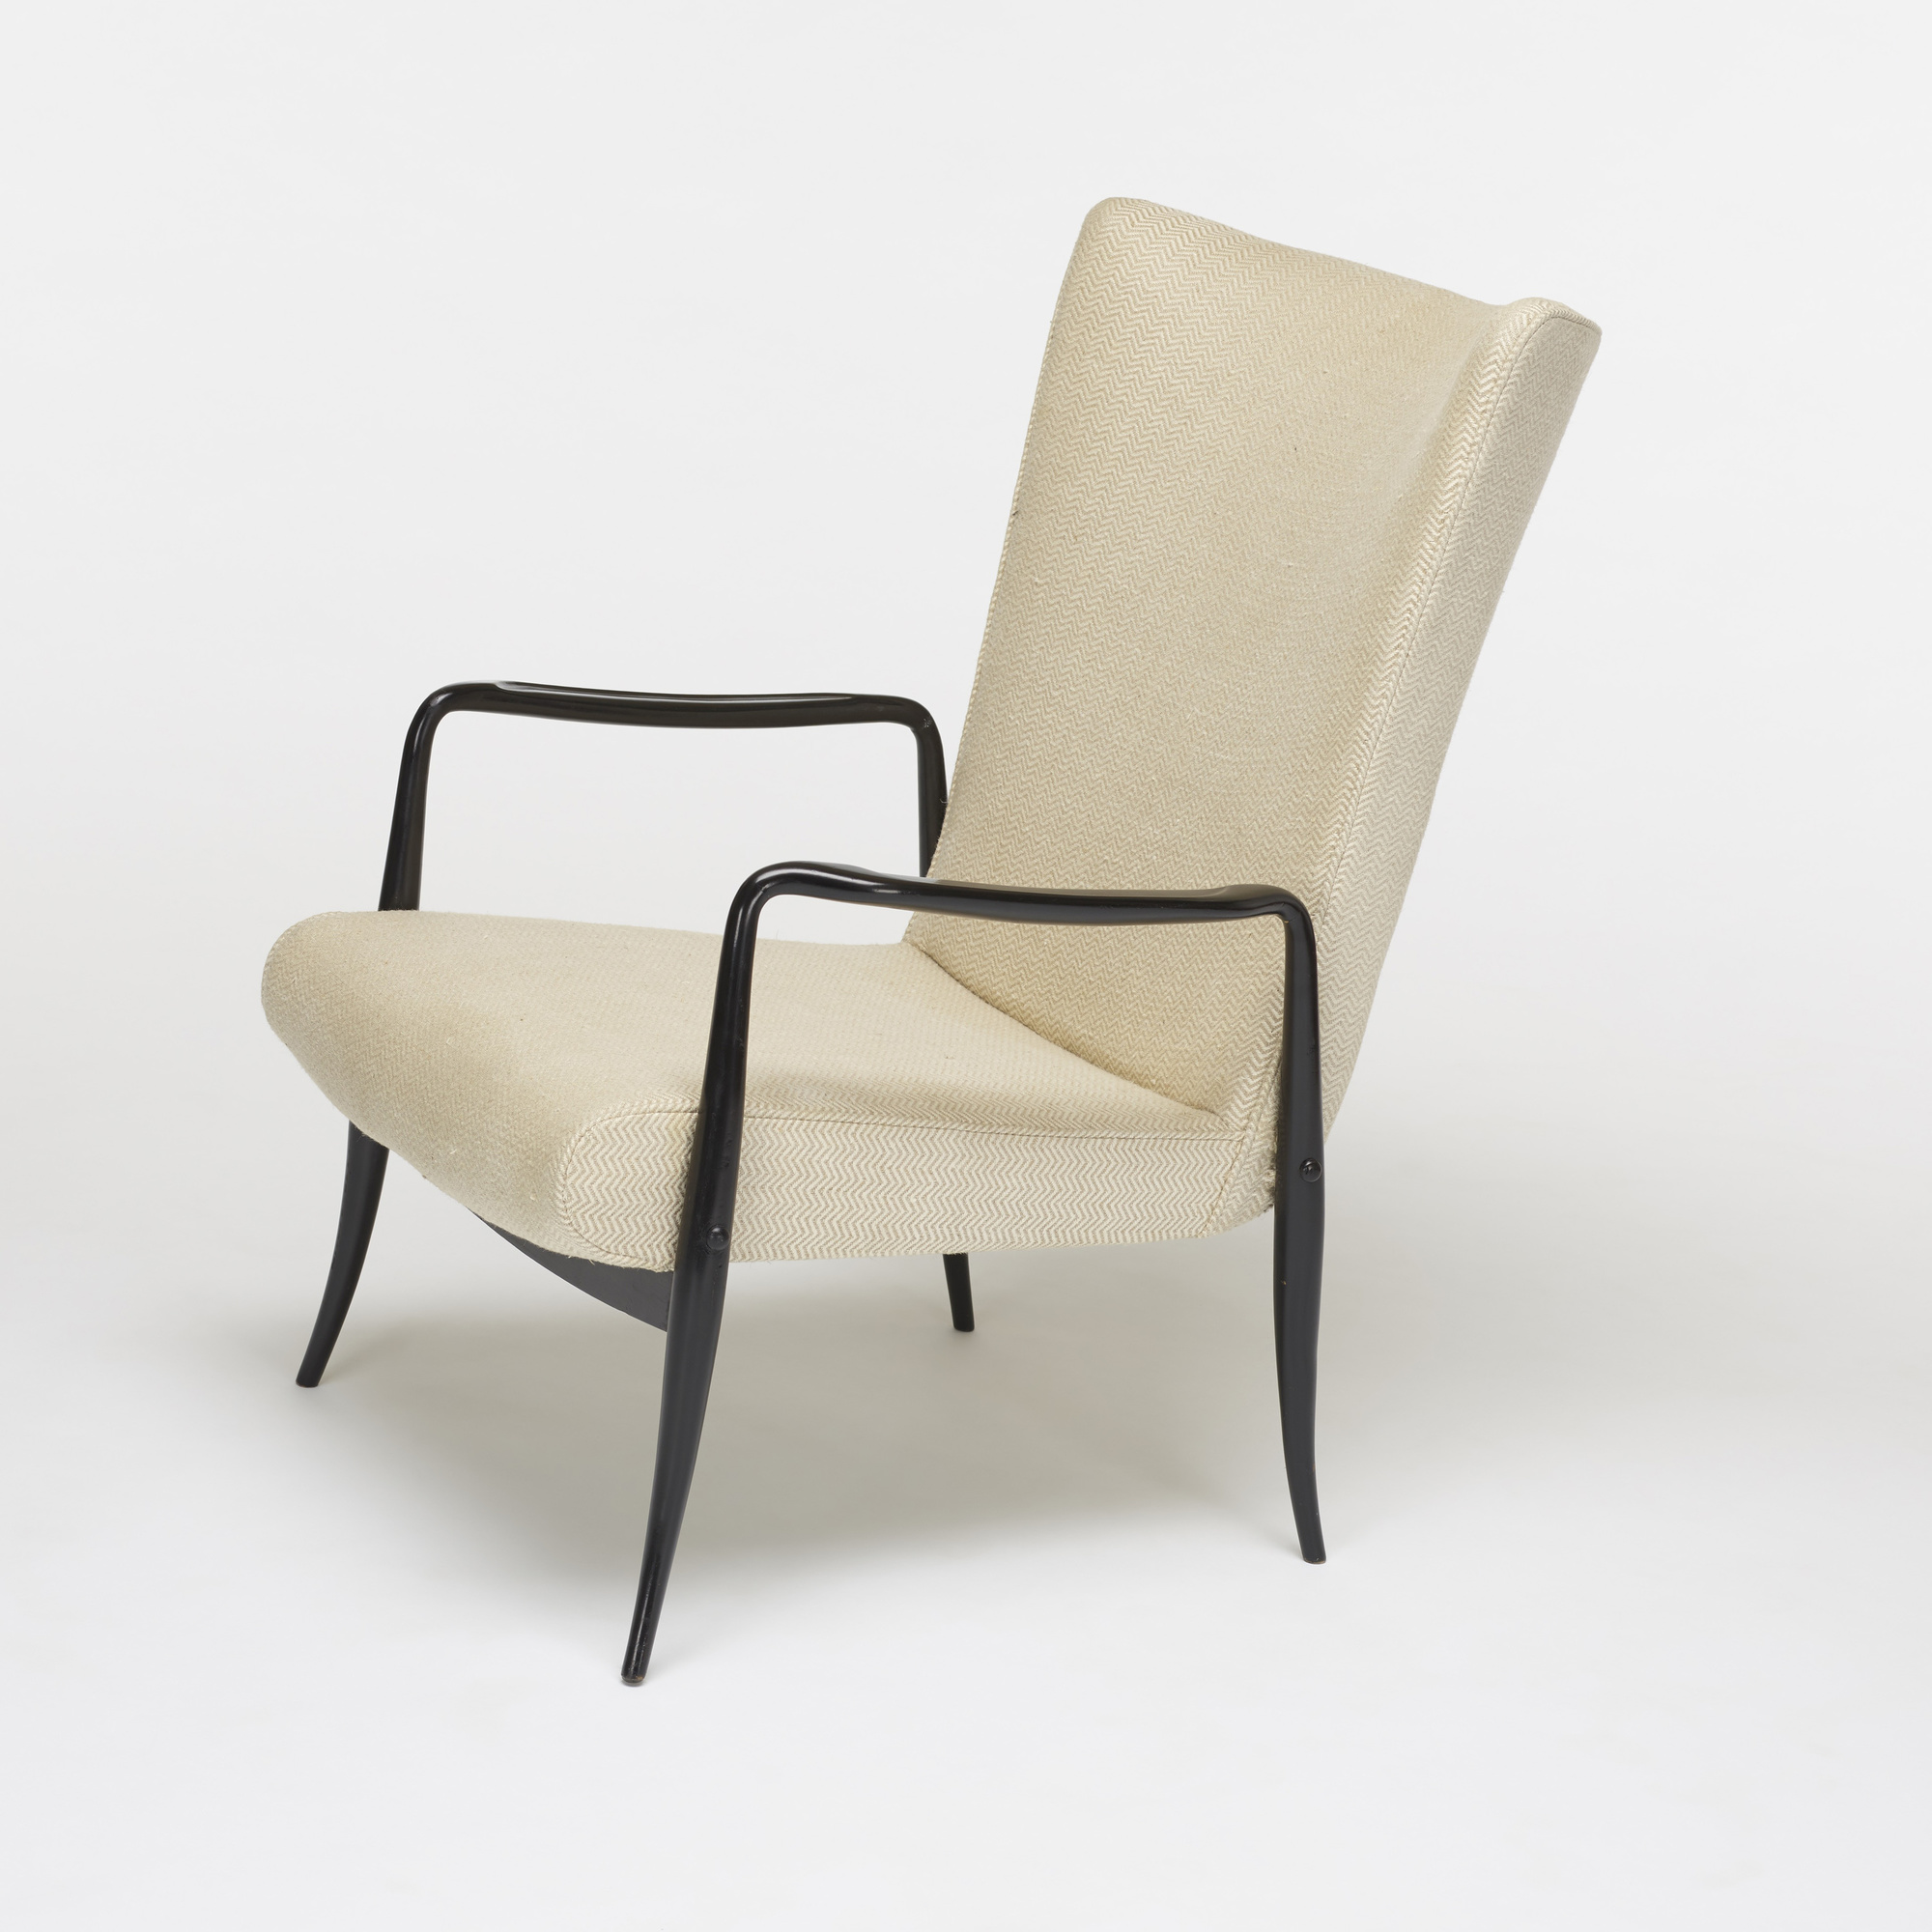 173: Brazilian / lounge chair (3 of 3)